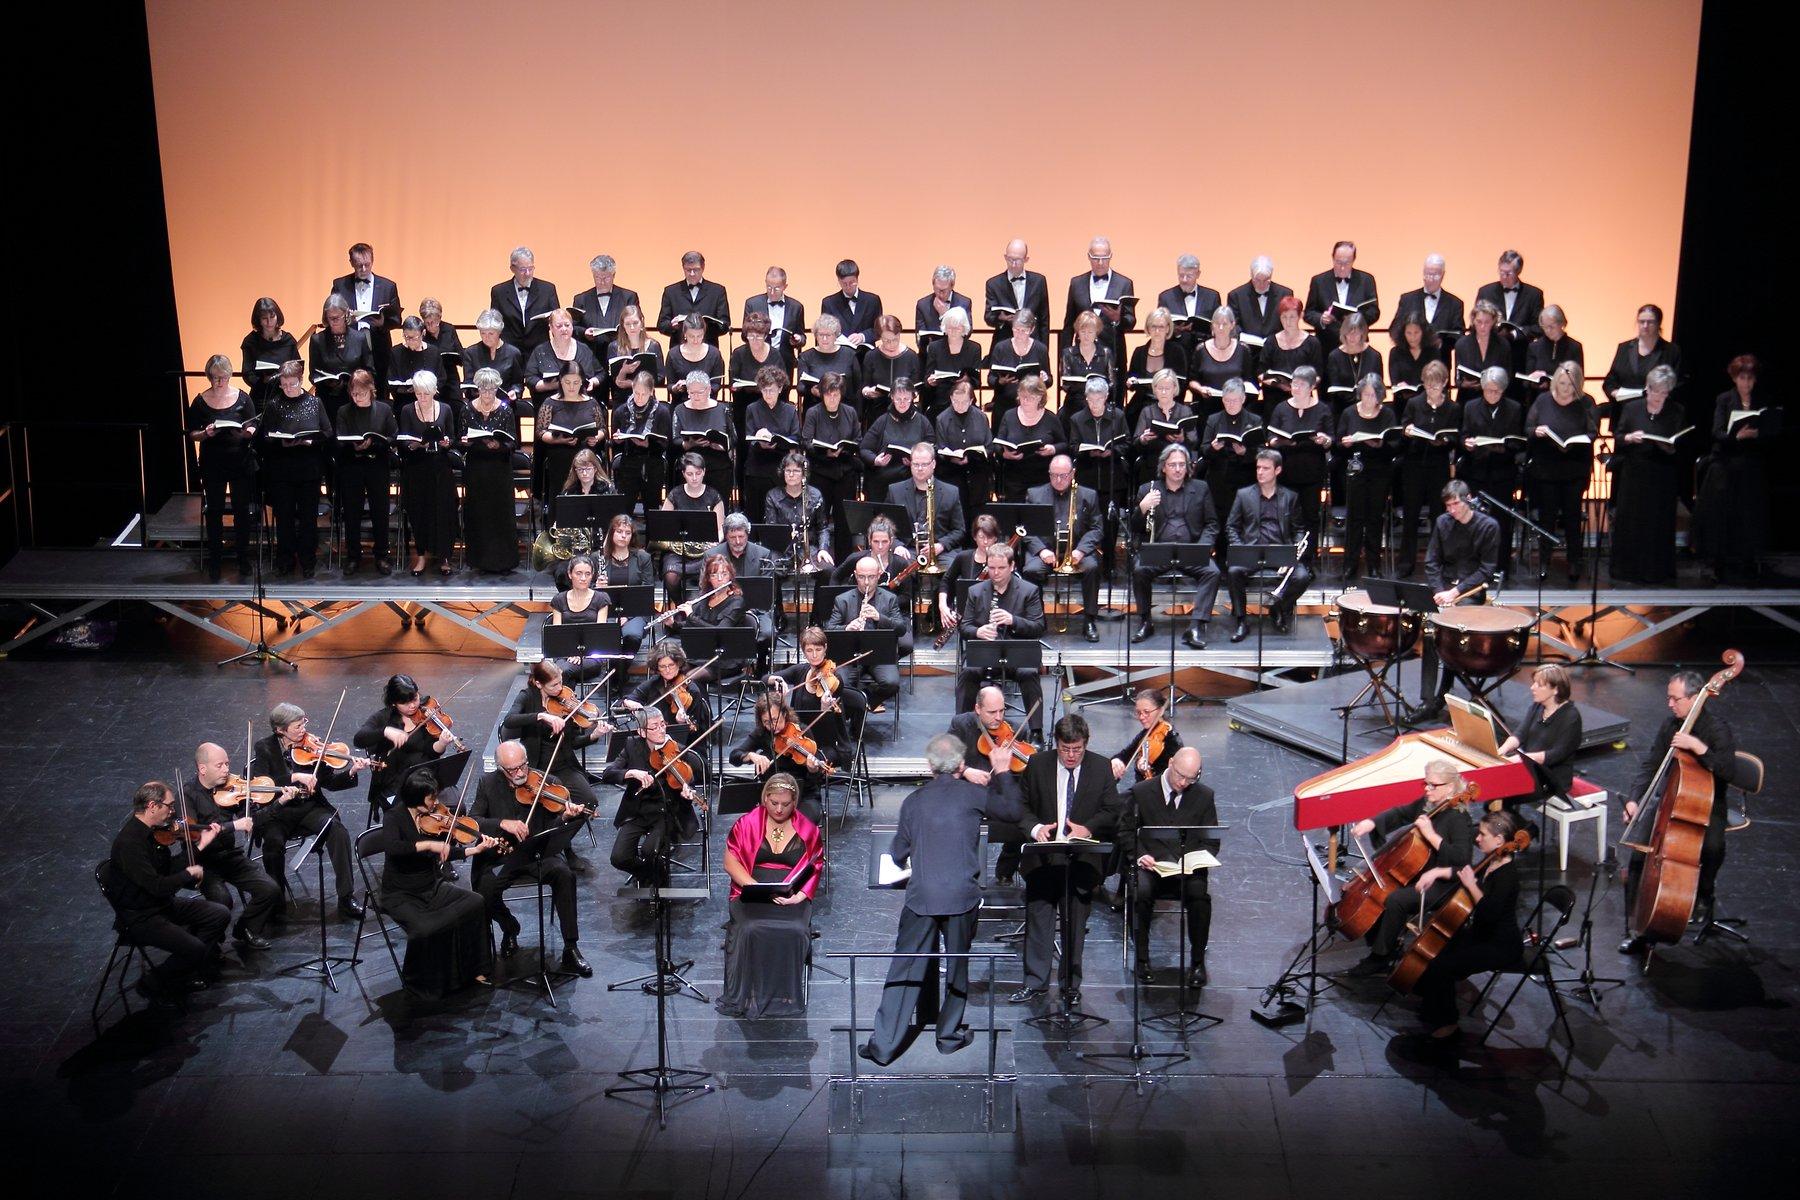 Choeur Musica Mediante et Sinfonia Metropole Orchestre